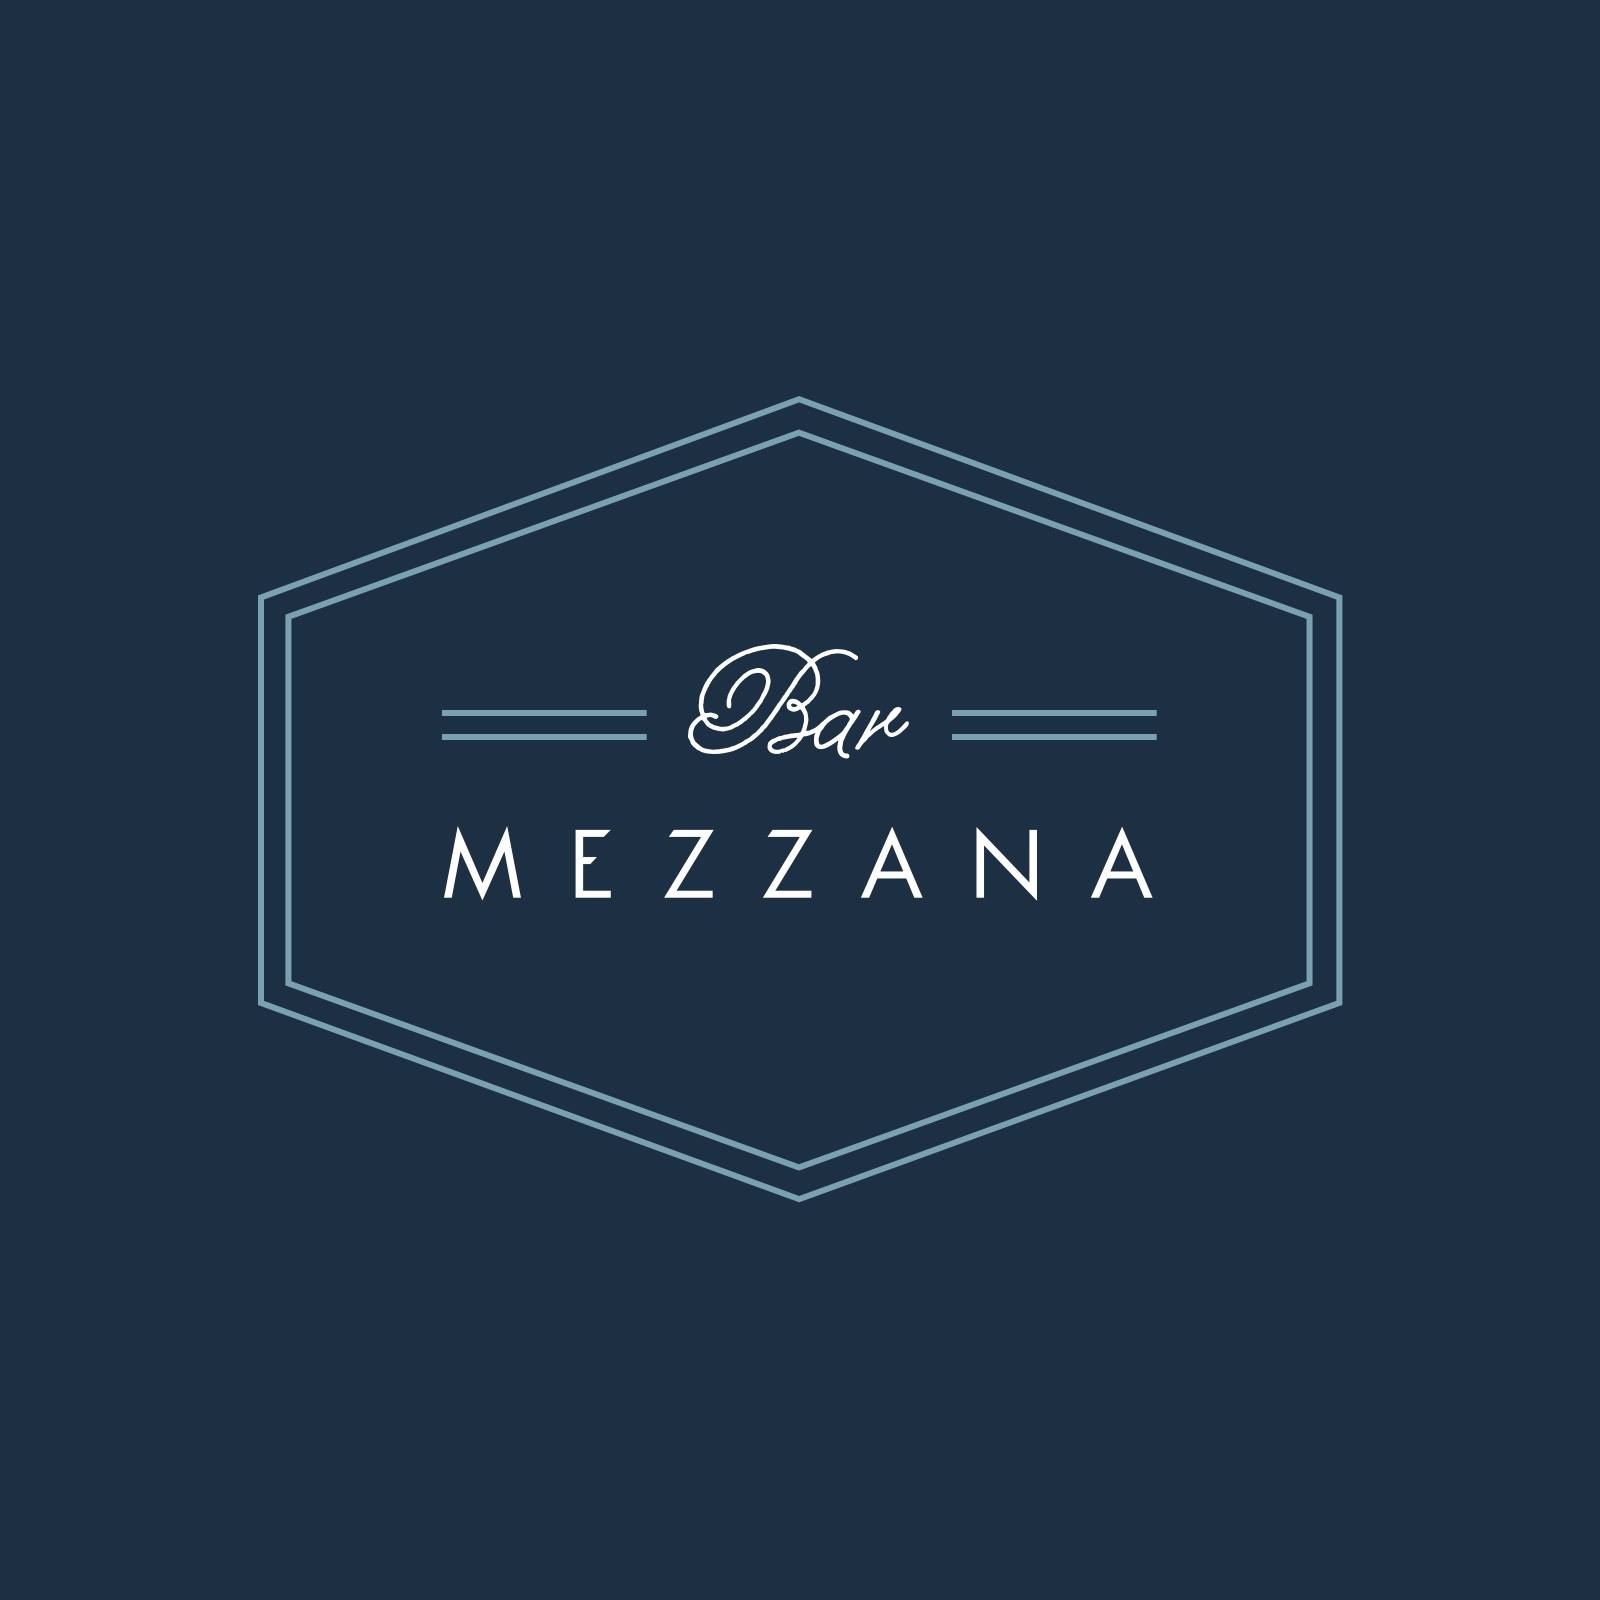 Bar Mezzana logo